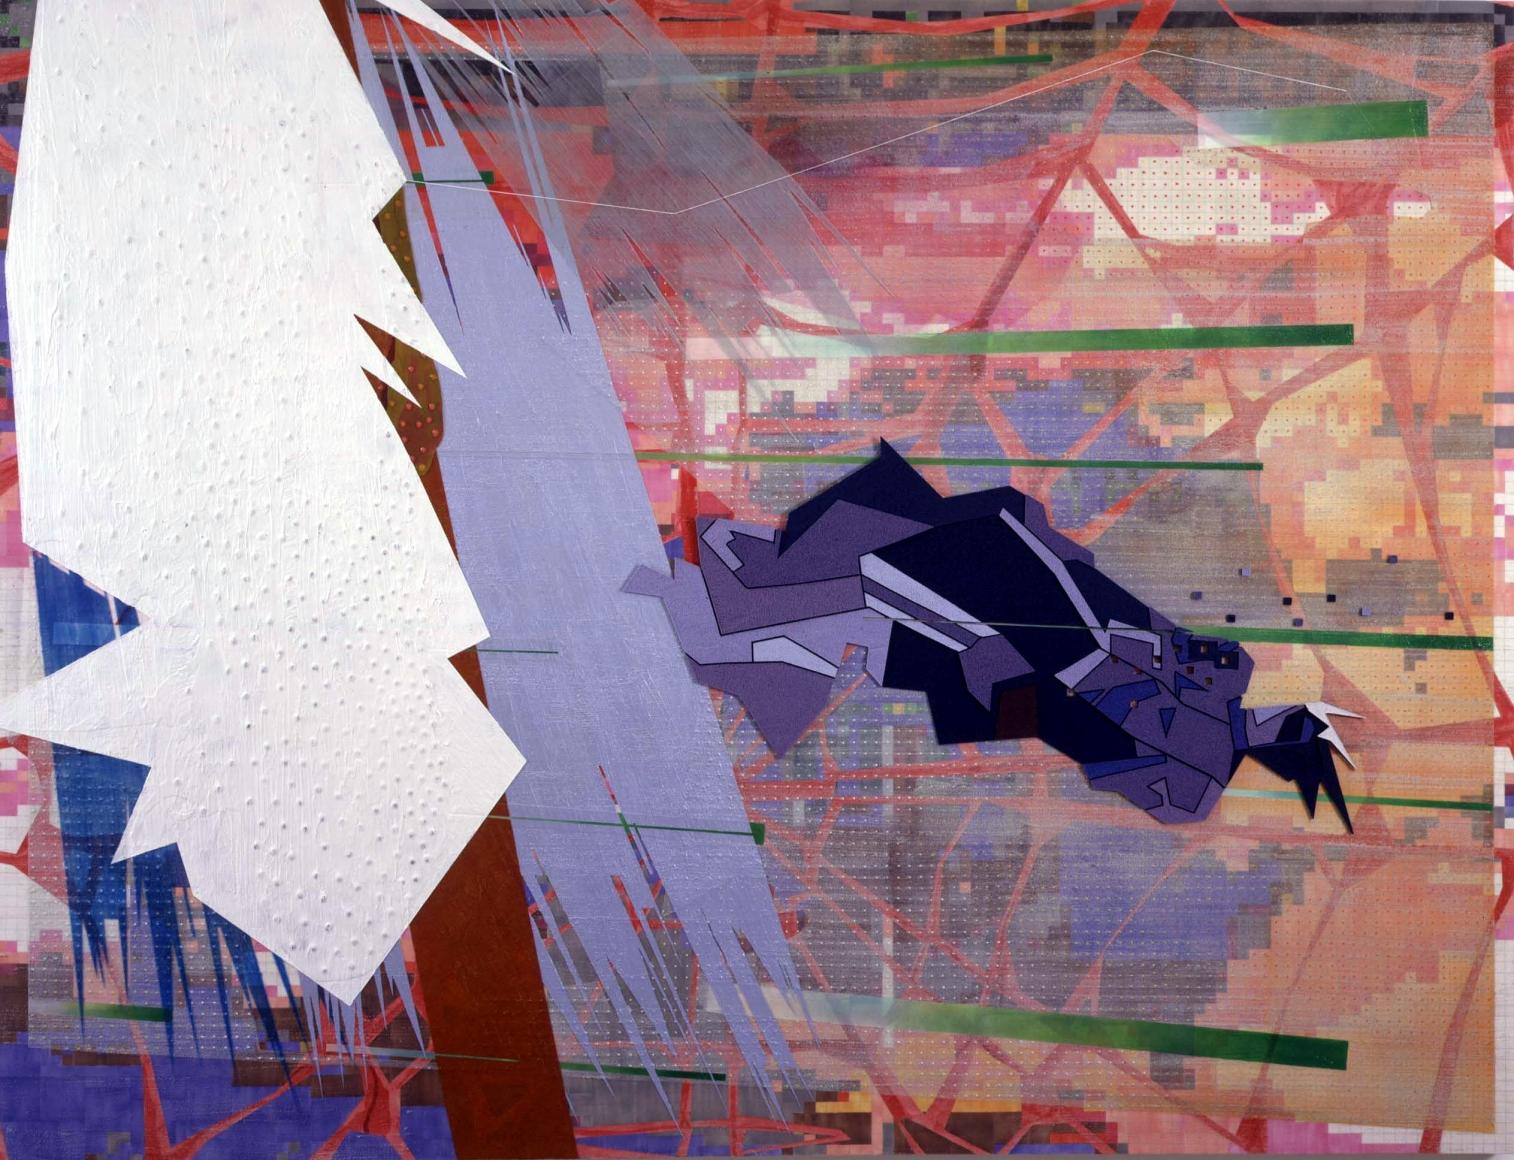 PEDRO BARBEITO, Fallen, 2002